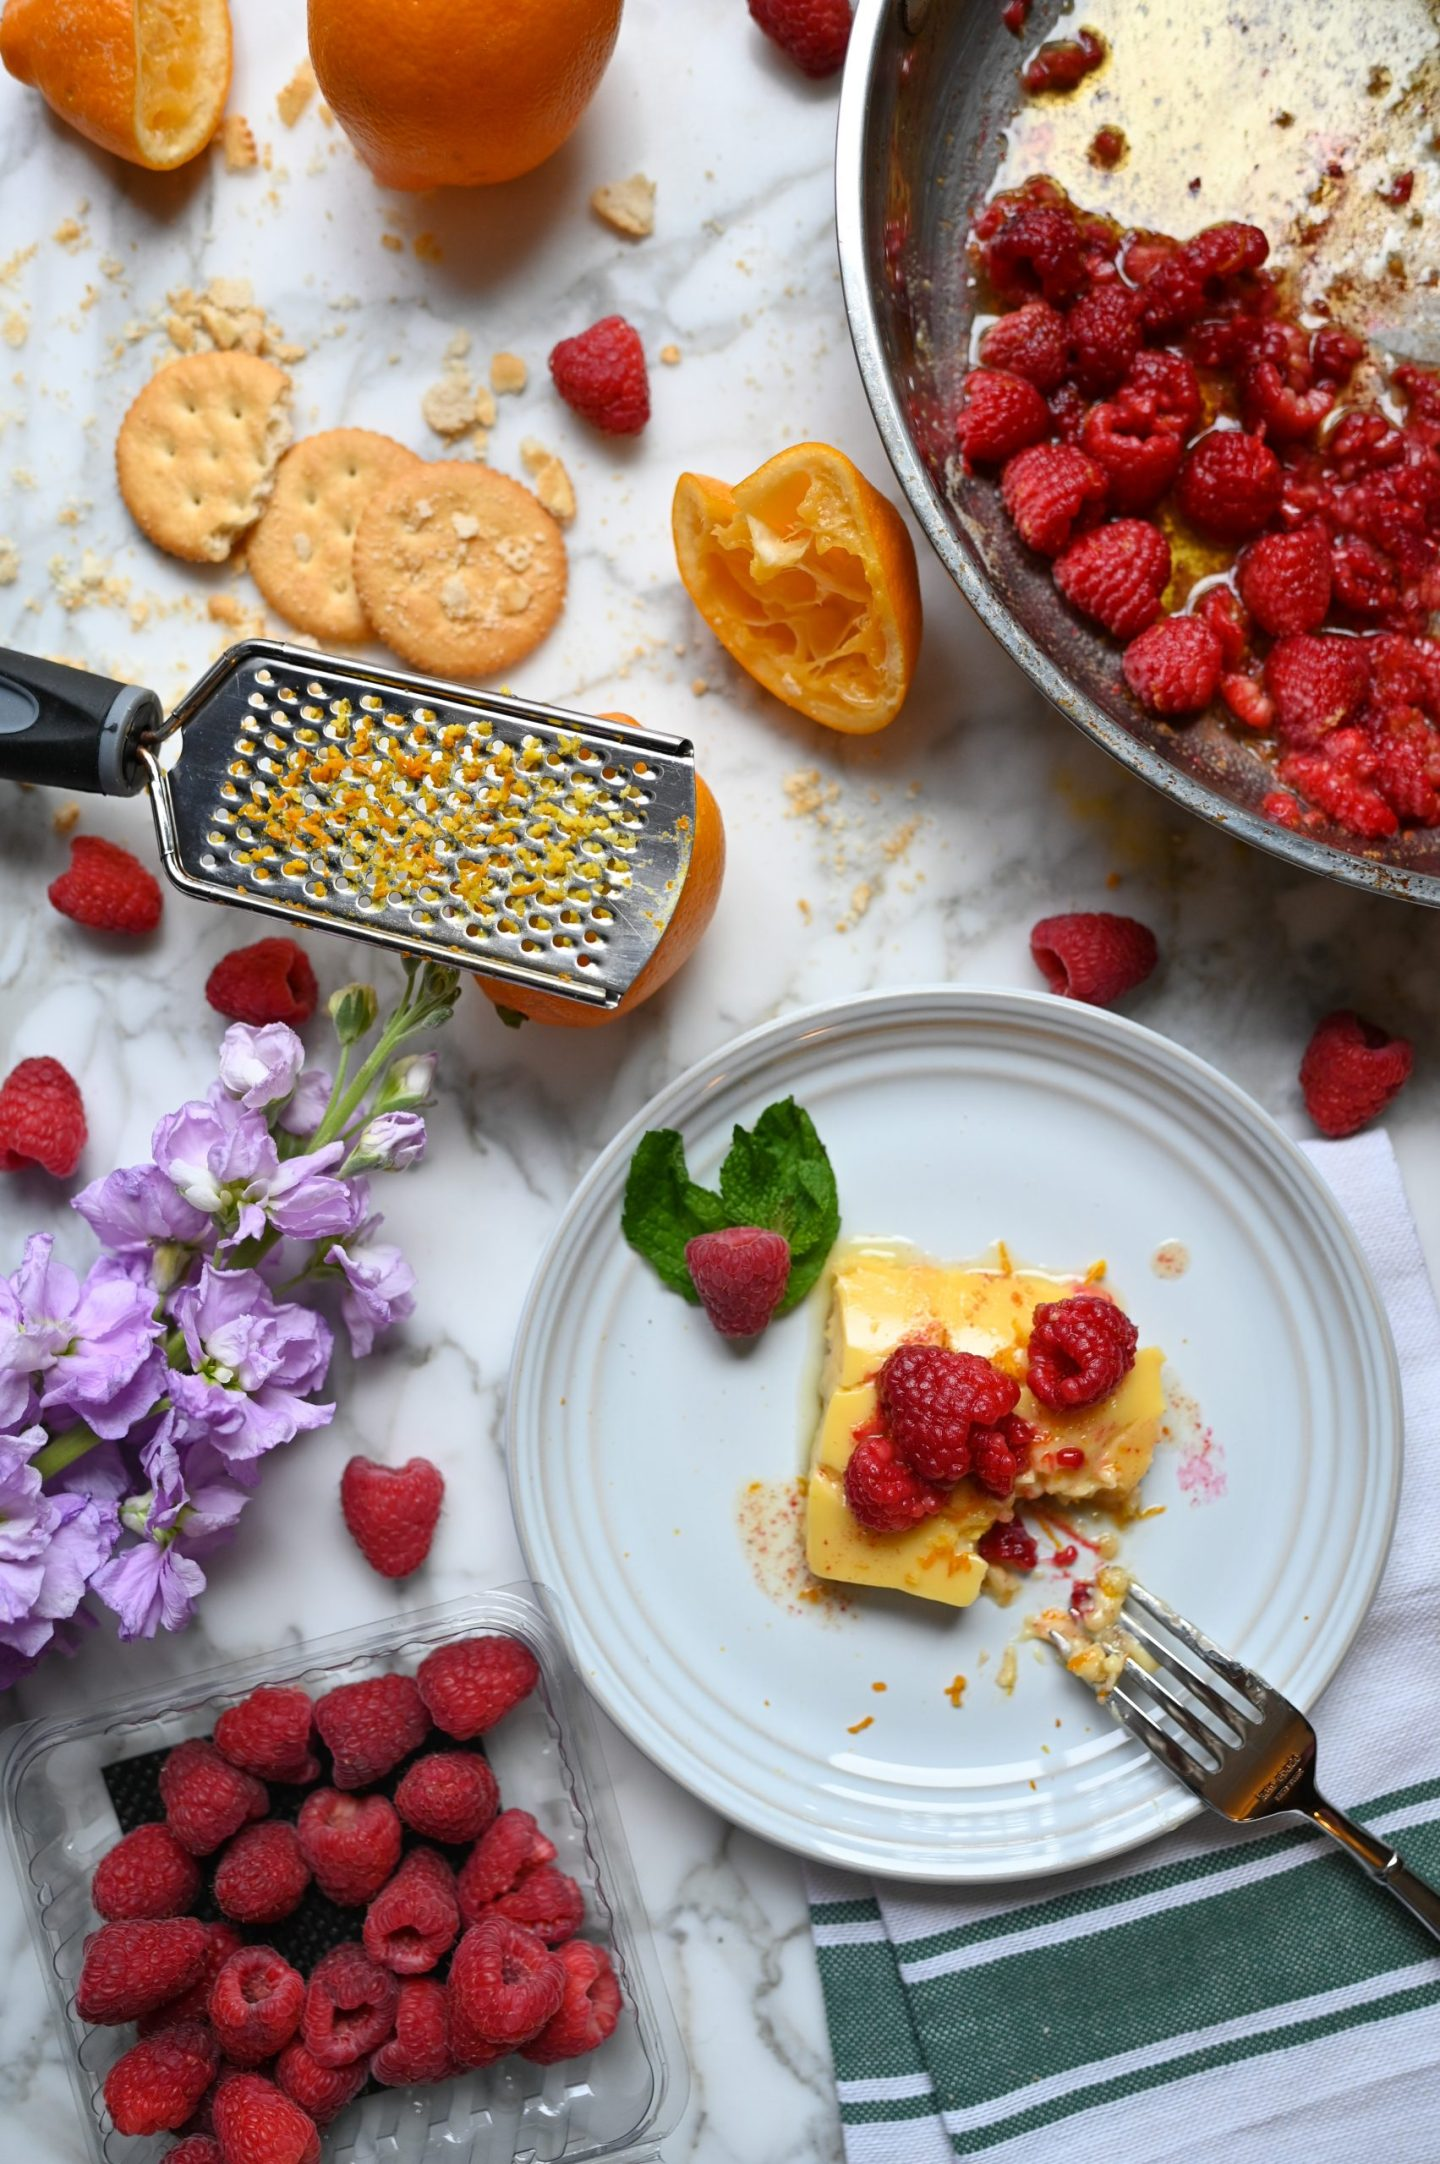 Lemon Bars With Brown Butter Raspberries